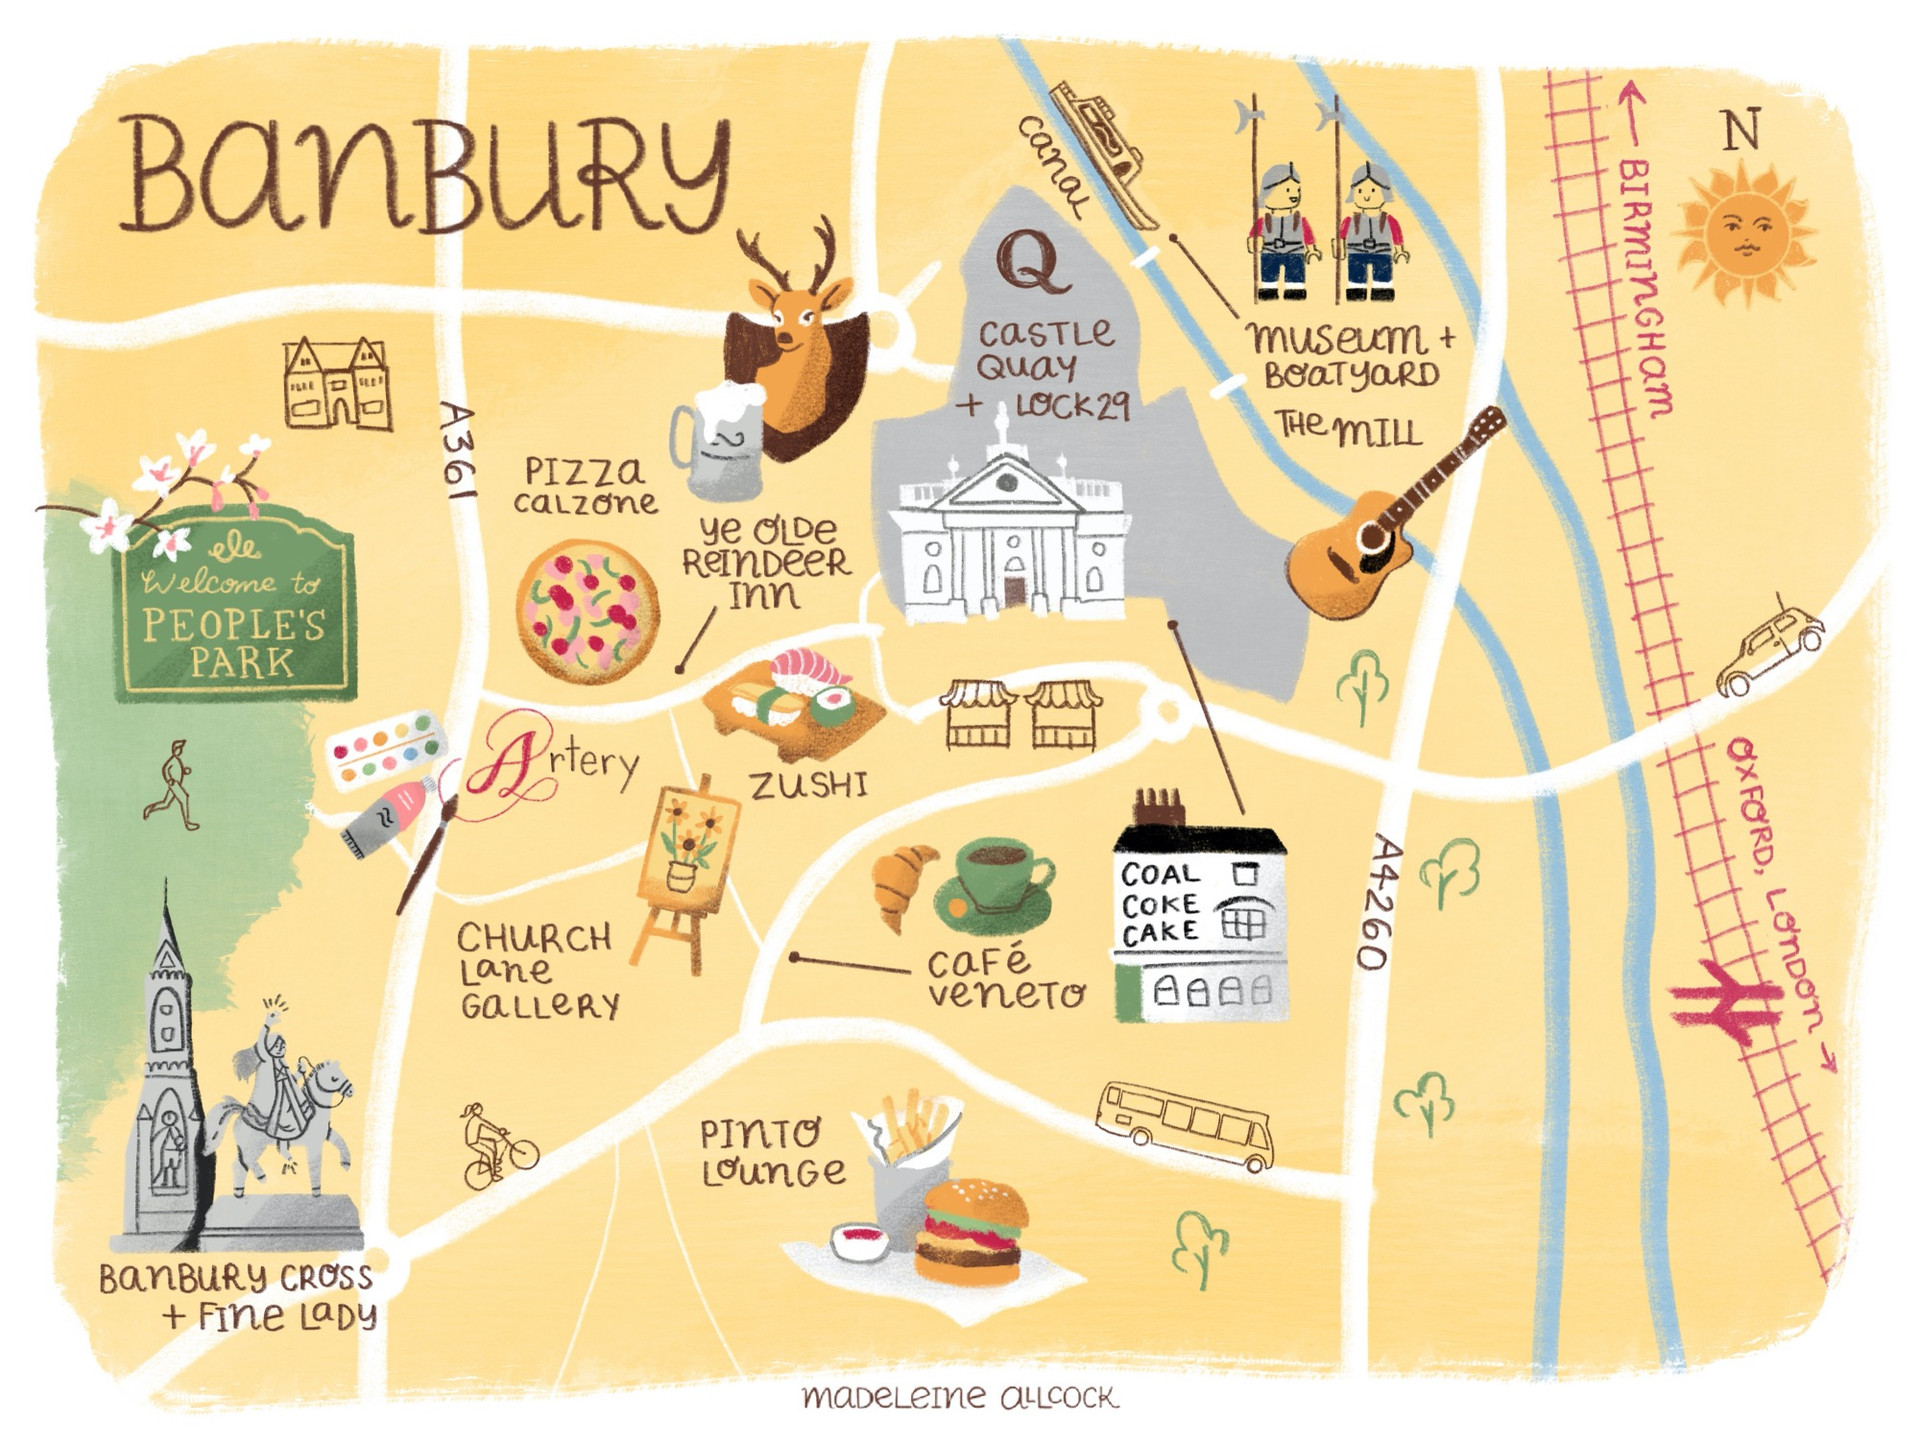 Map of Banbury